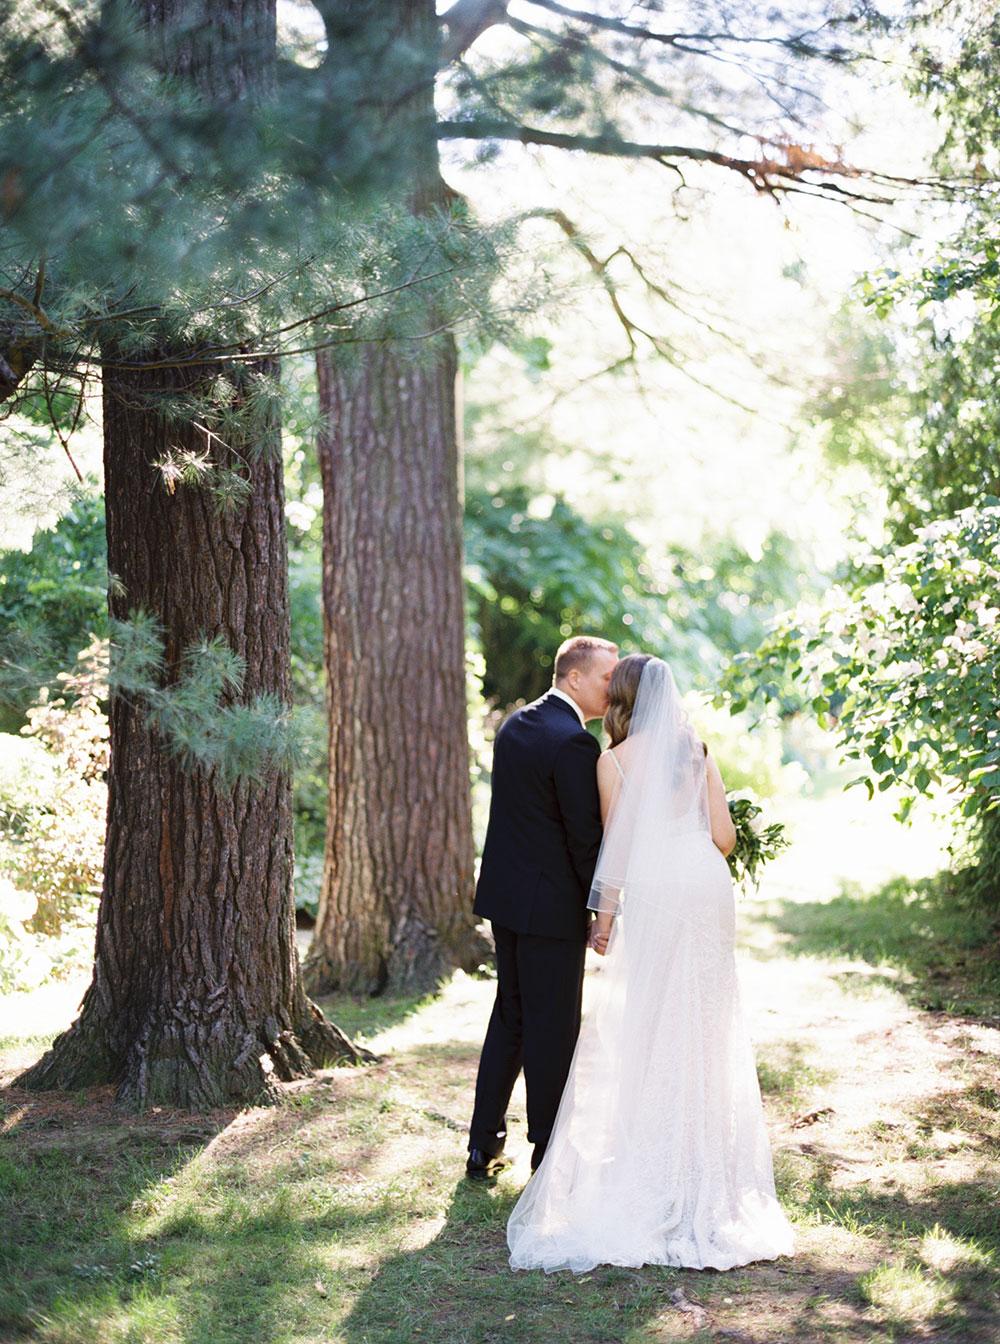 kurtz-orchards-wedding-gracewood-estate-niagara-on-the-lake-photo-by-katie-nicolle-photography-0044.JPG